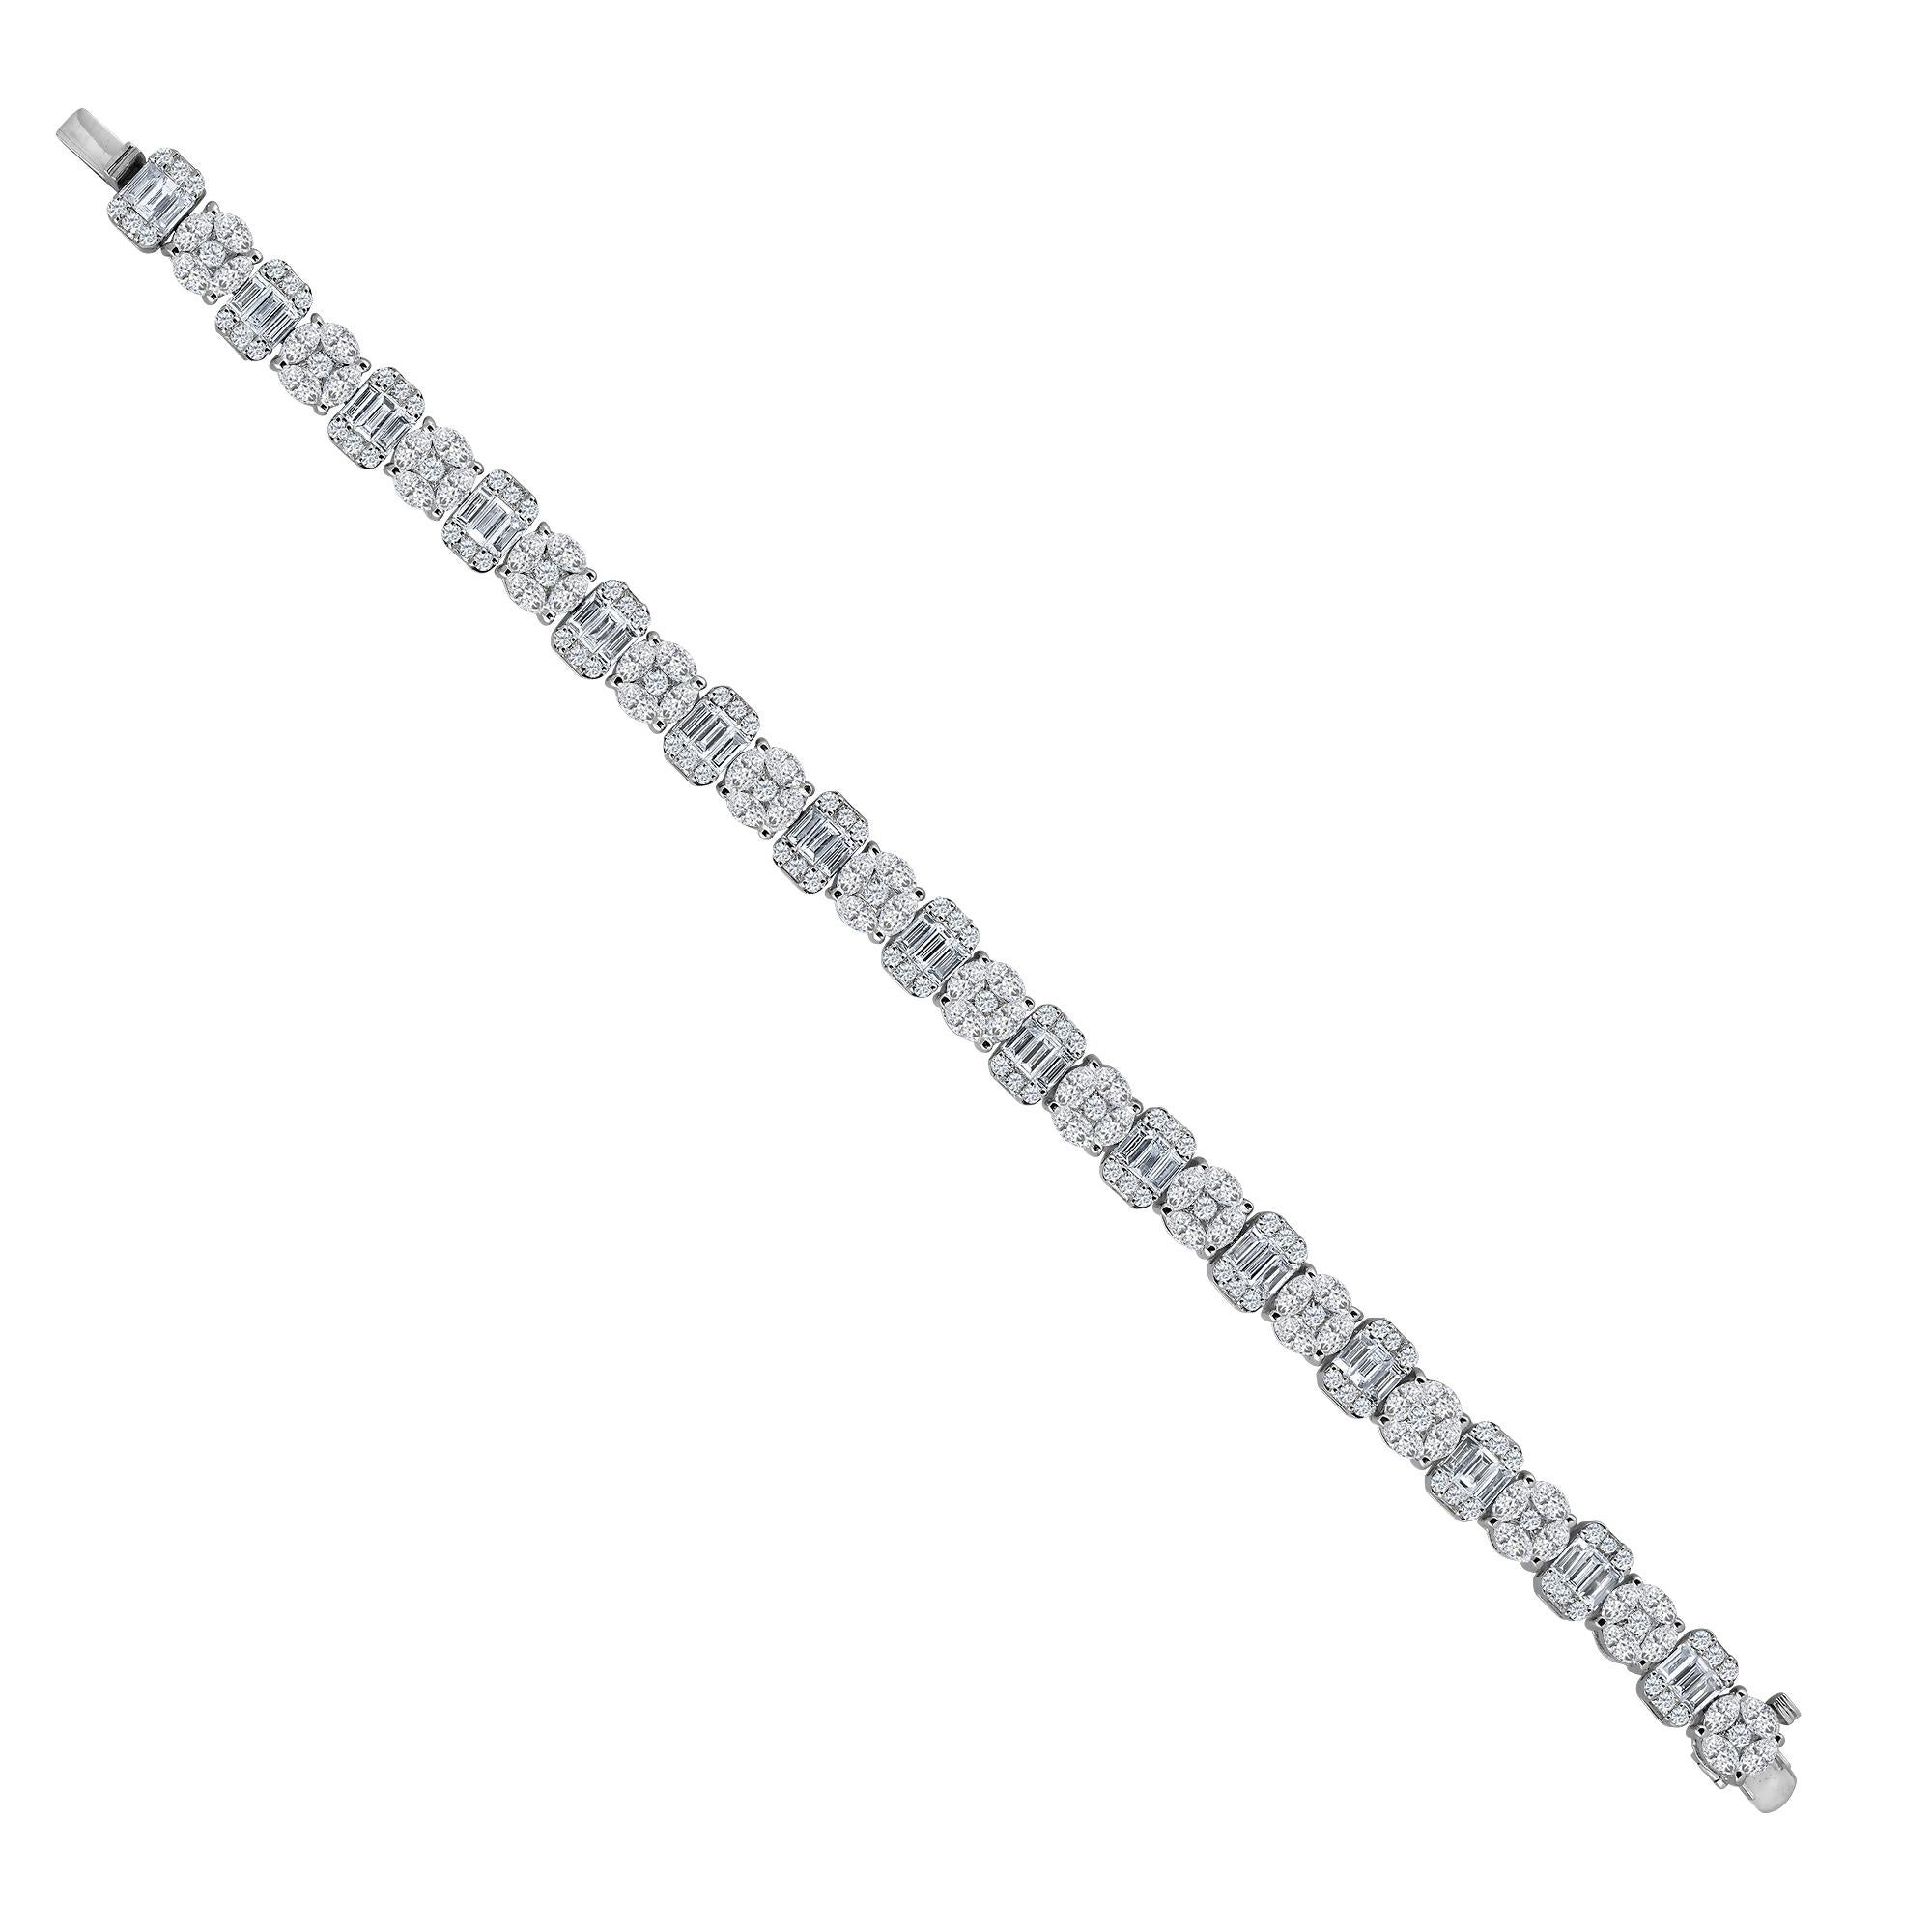 Emilio Jewelry 10.65 Carat Diamond Bracelet